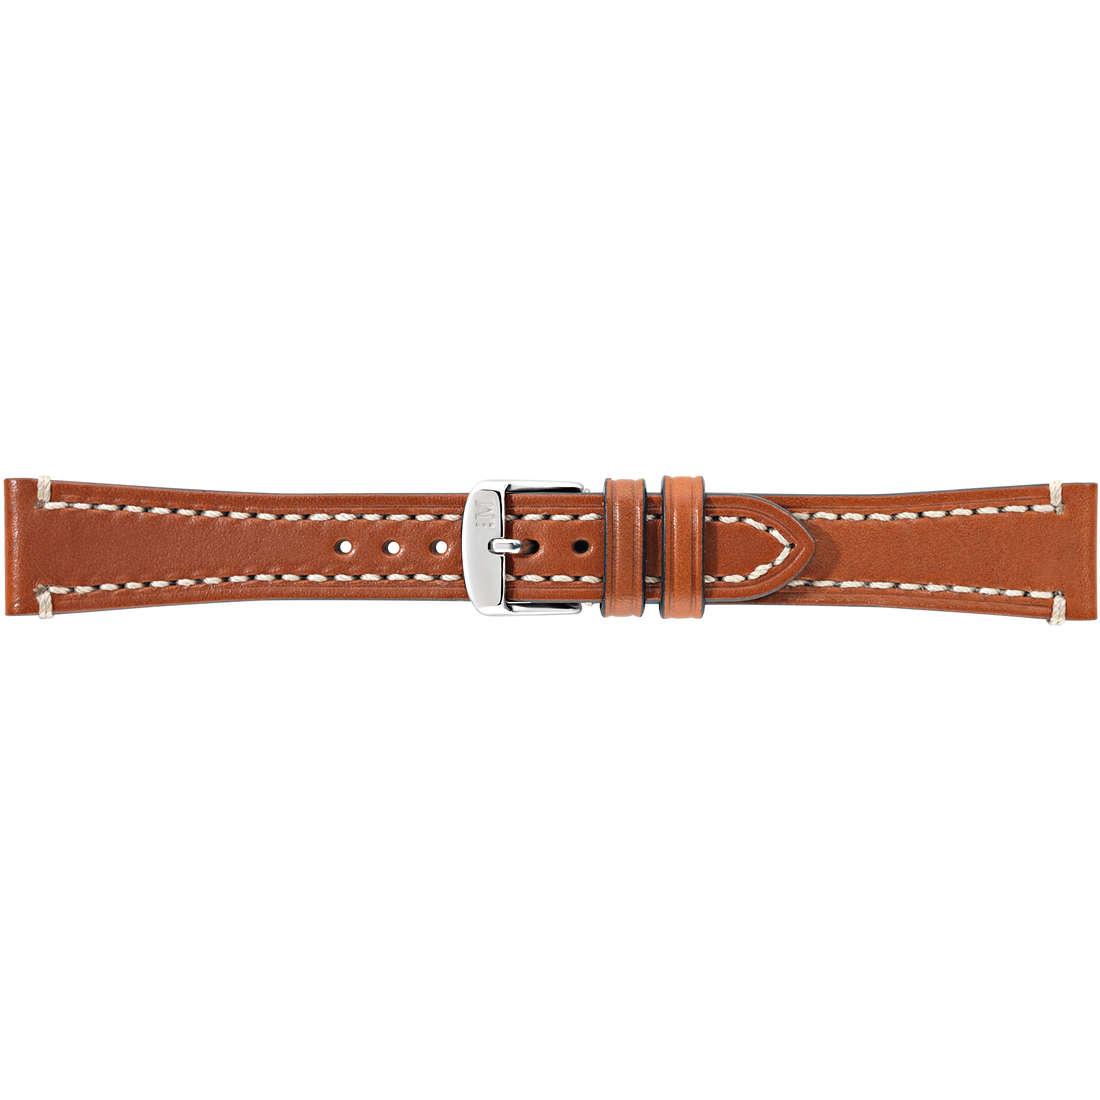 watch watch bands watch straps man Morellato Manufatti A01X4539B51041CR22